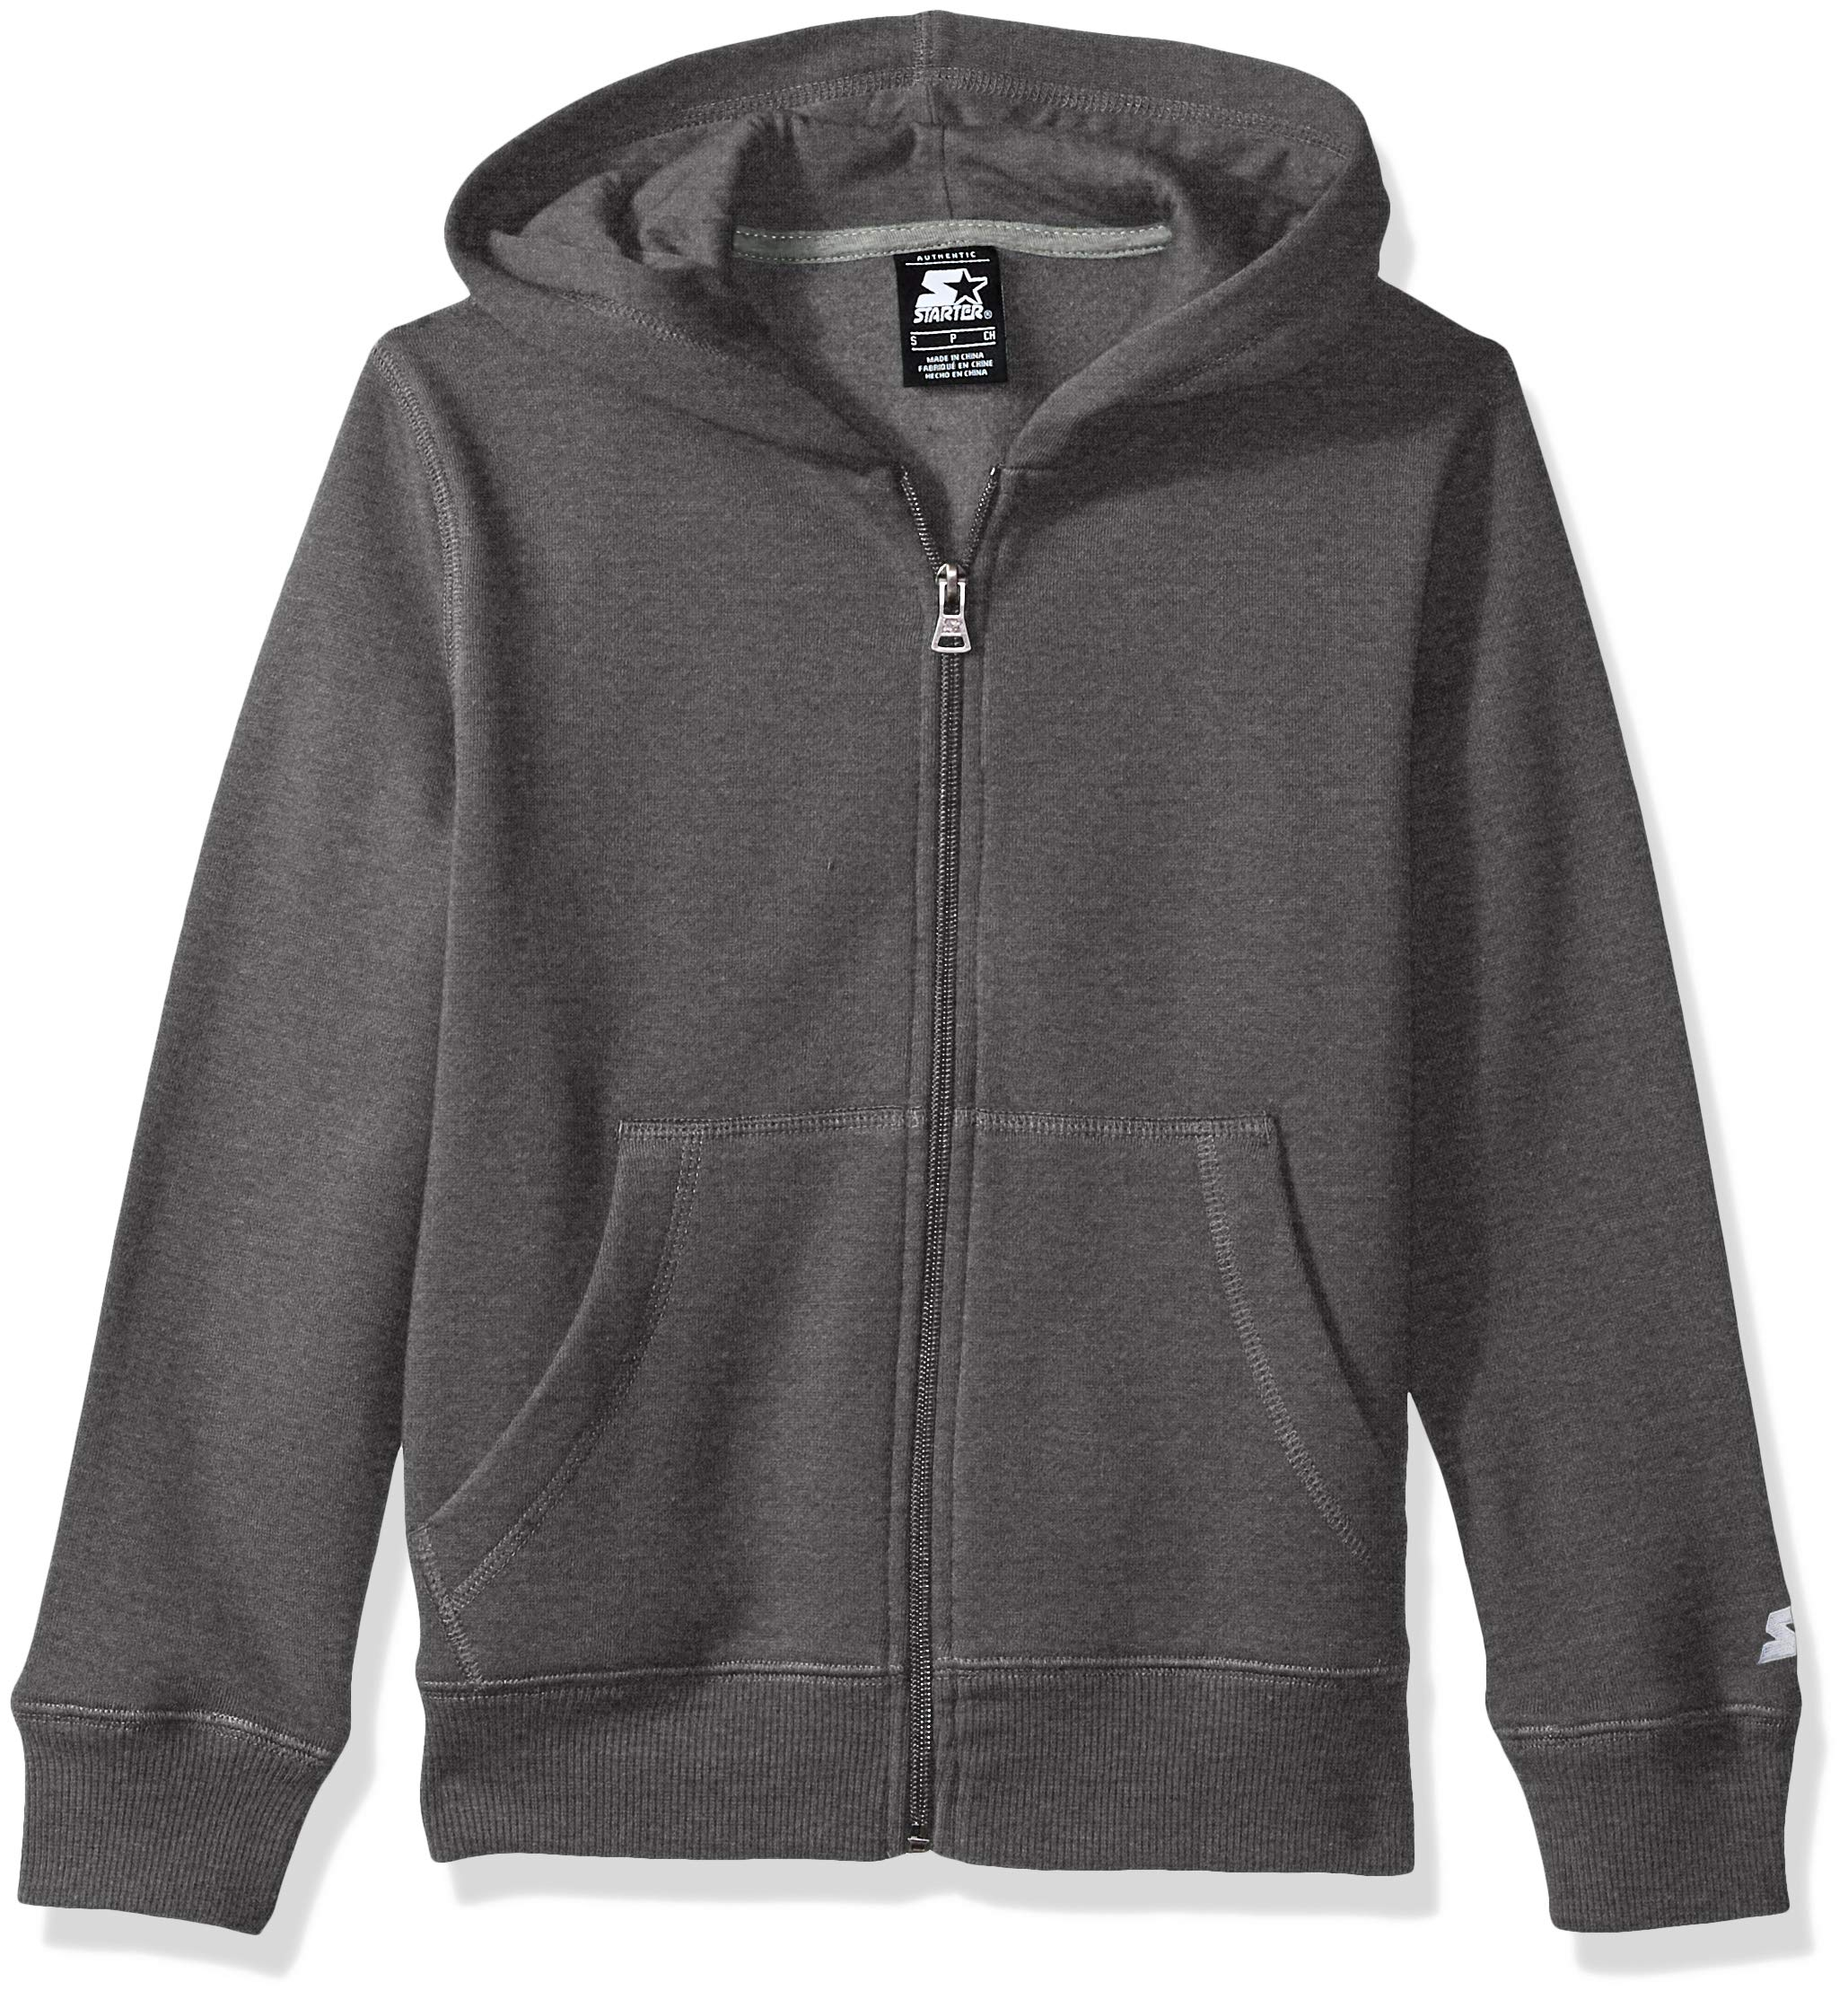 Starter Boys' Solid Zip-Up Hoodie, Amazon Exclusive, Iron Grey Heather, M (8/10)